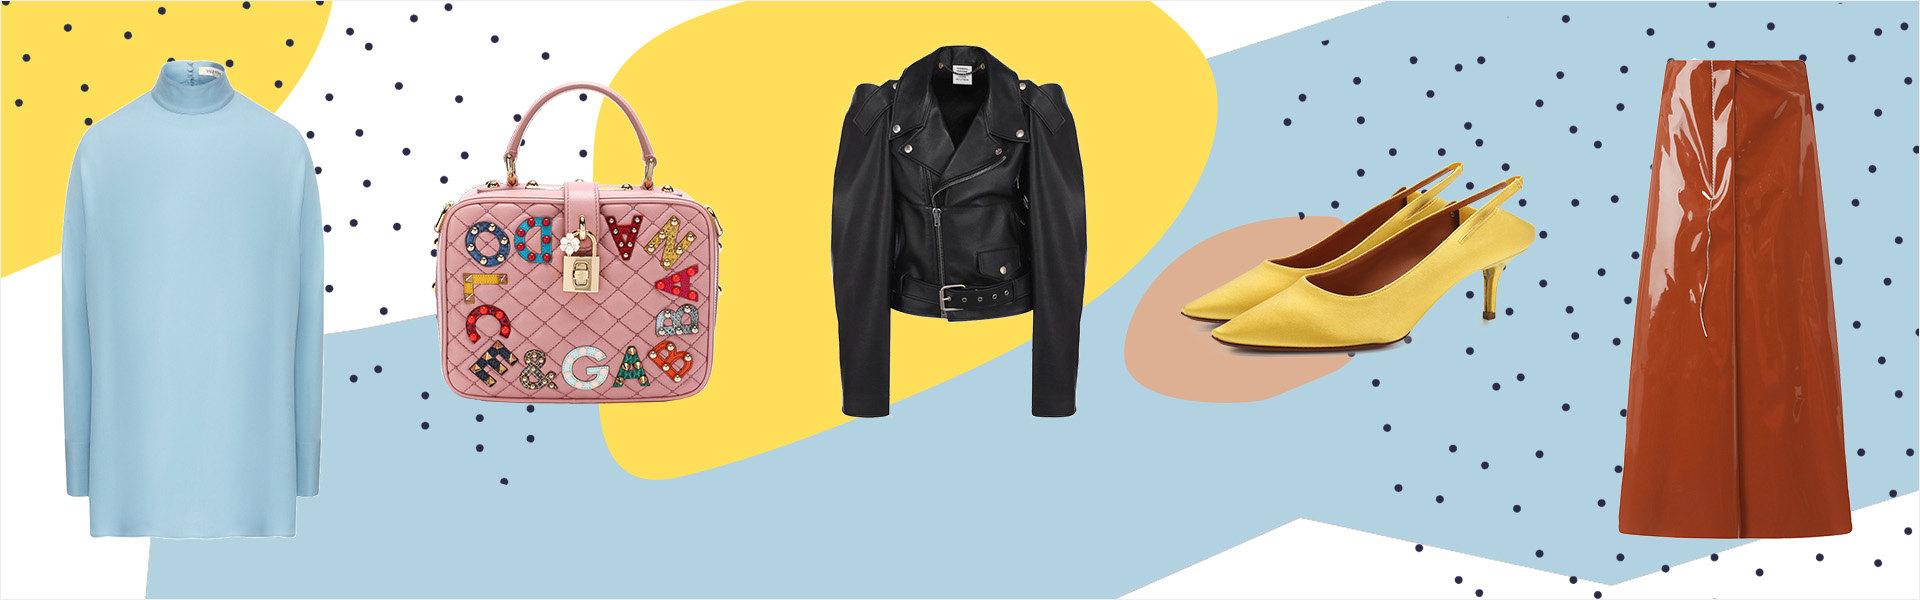 ЦУМ Дисконт: модное сафари в вашем гардеробе